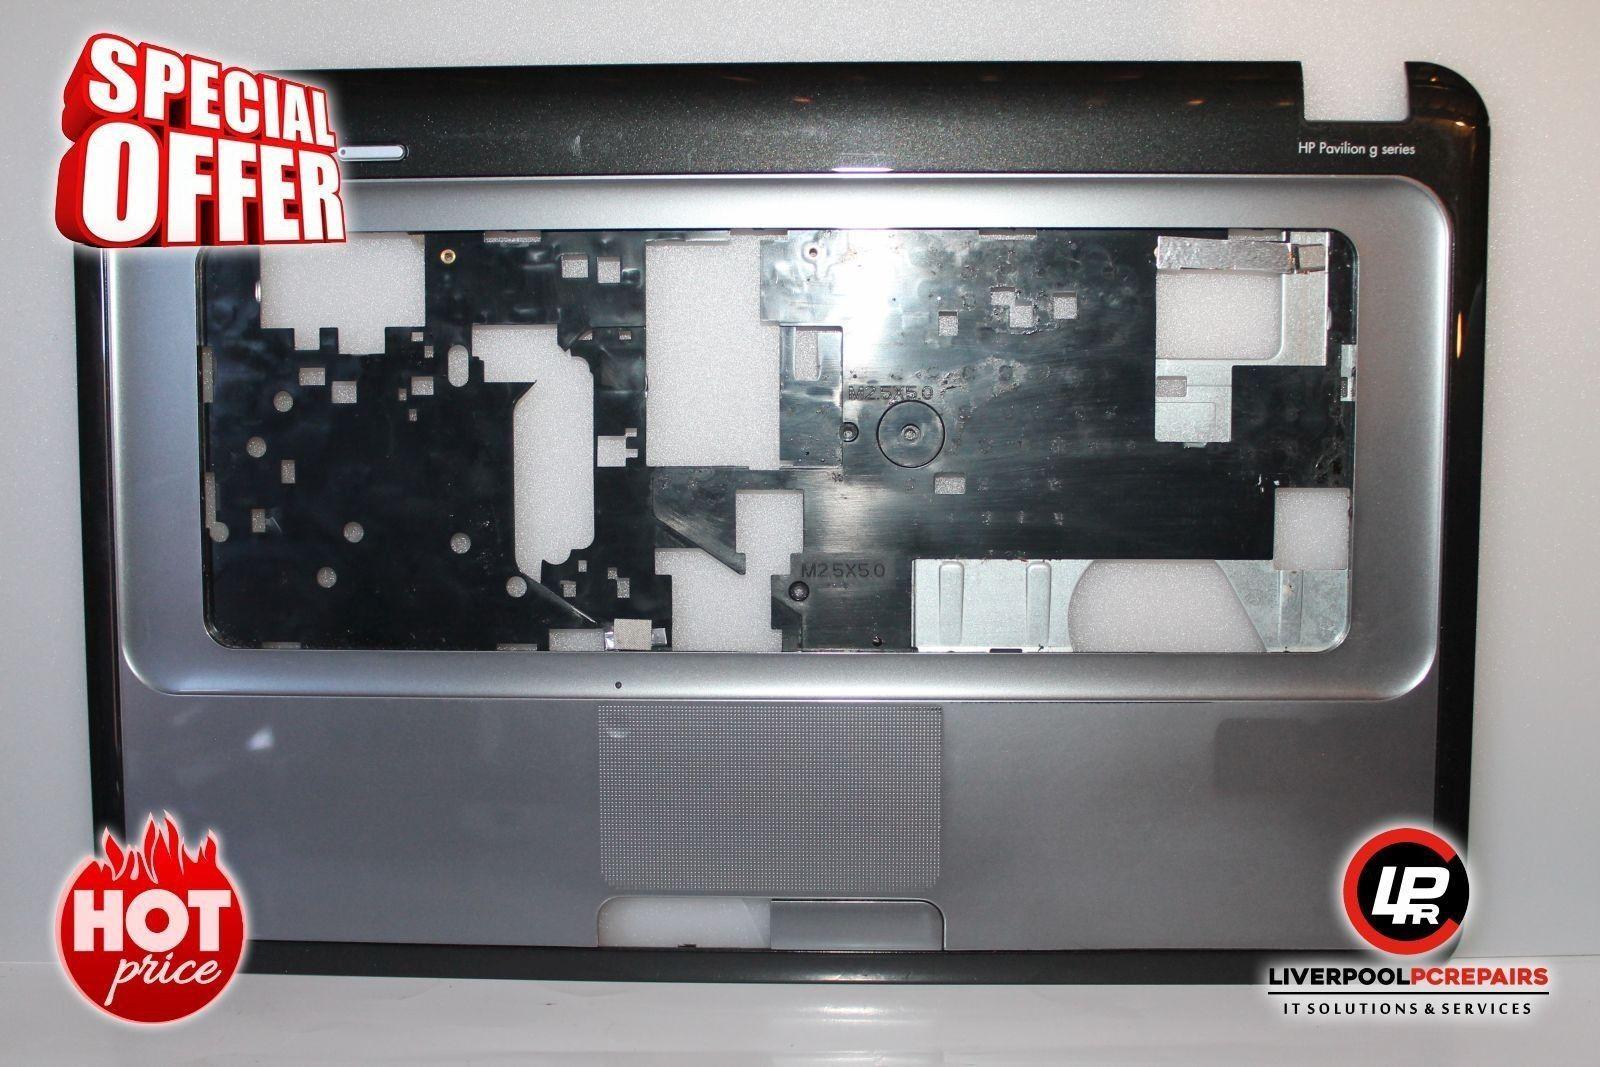 Hp Dv6000 Manuals Toshiba Color Tv 34hf85 Service Manual Array Pavilion Laptop Repair Nemetas Rh Aufgegabelt Info